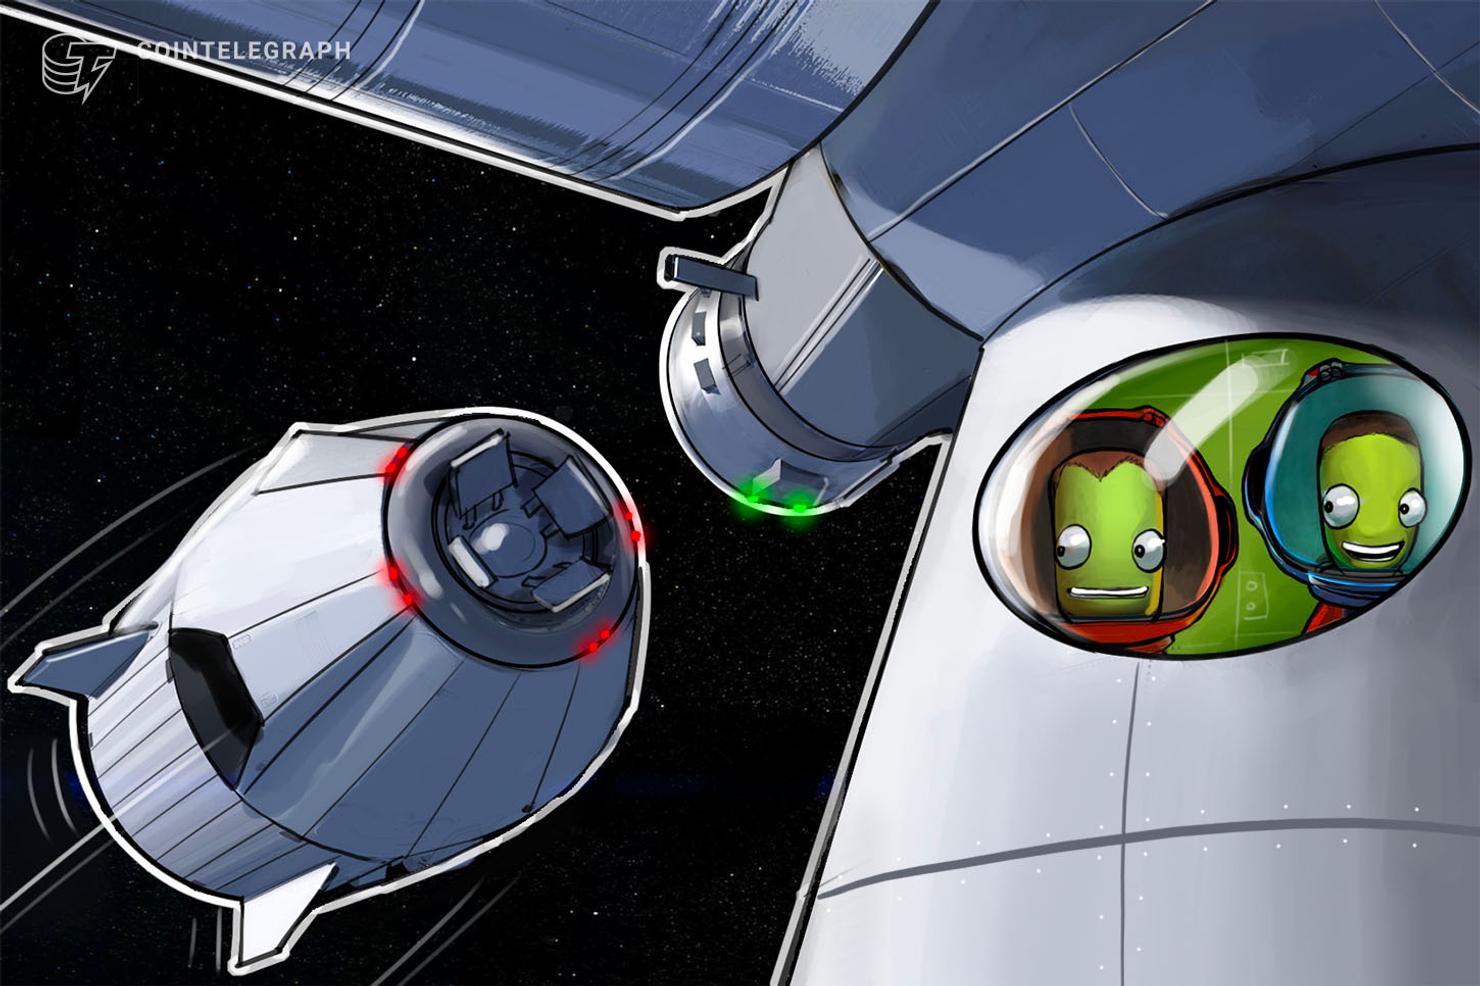 Report: Coinbase Negotiates Acquisition of Xapo's Bitcoin Custody Business